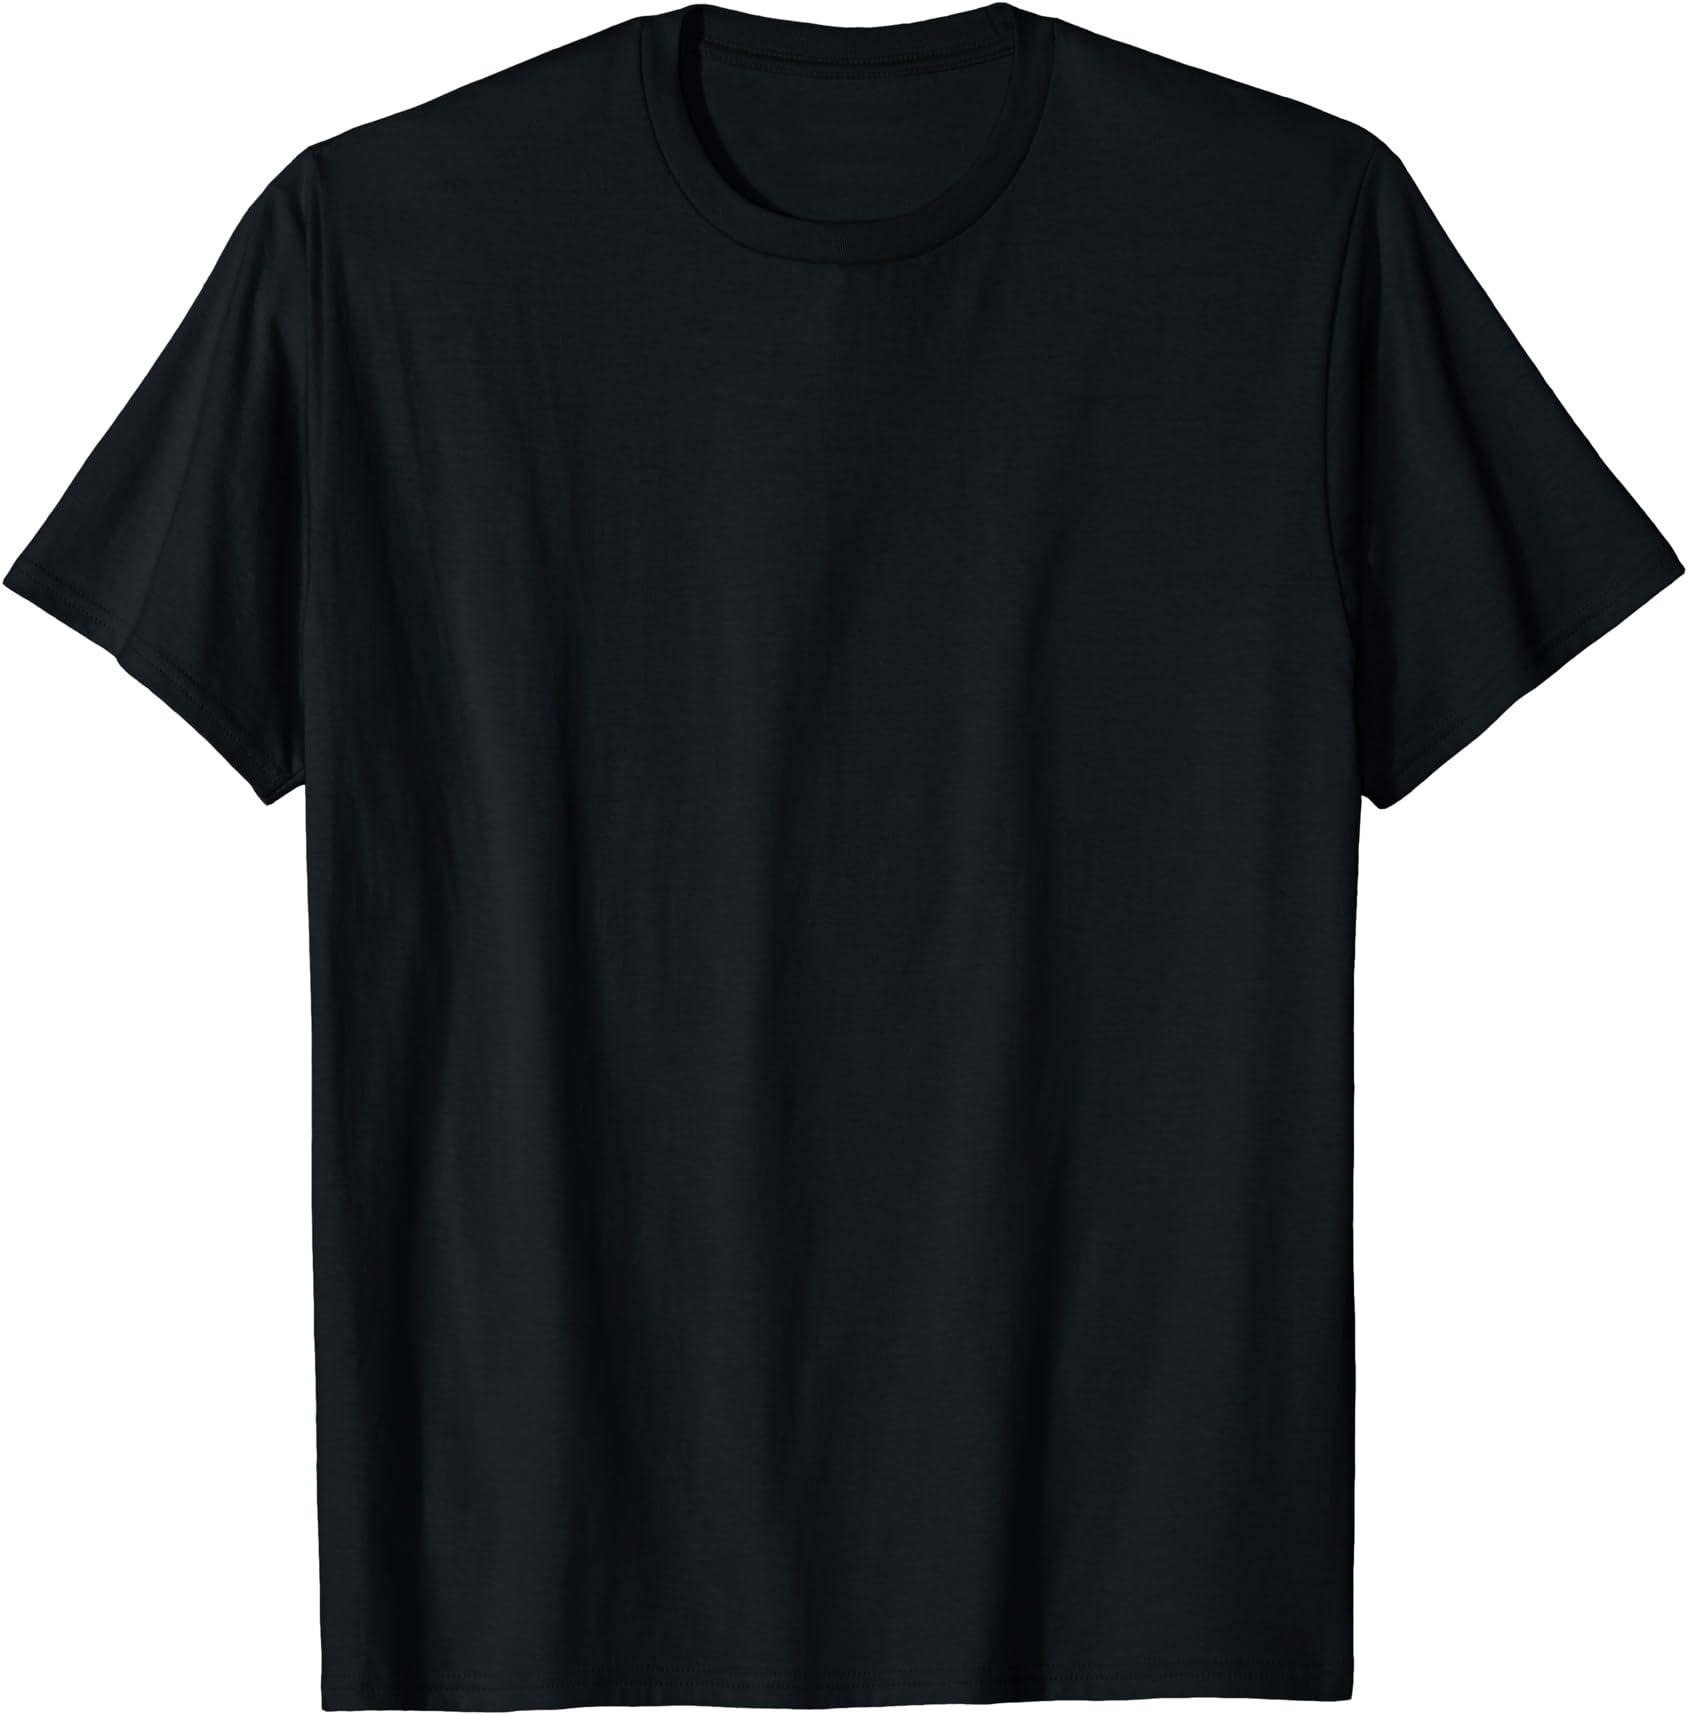 Qiop Nee Fantasy Football God Long Sleeve T-Shirt for Girls